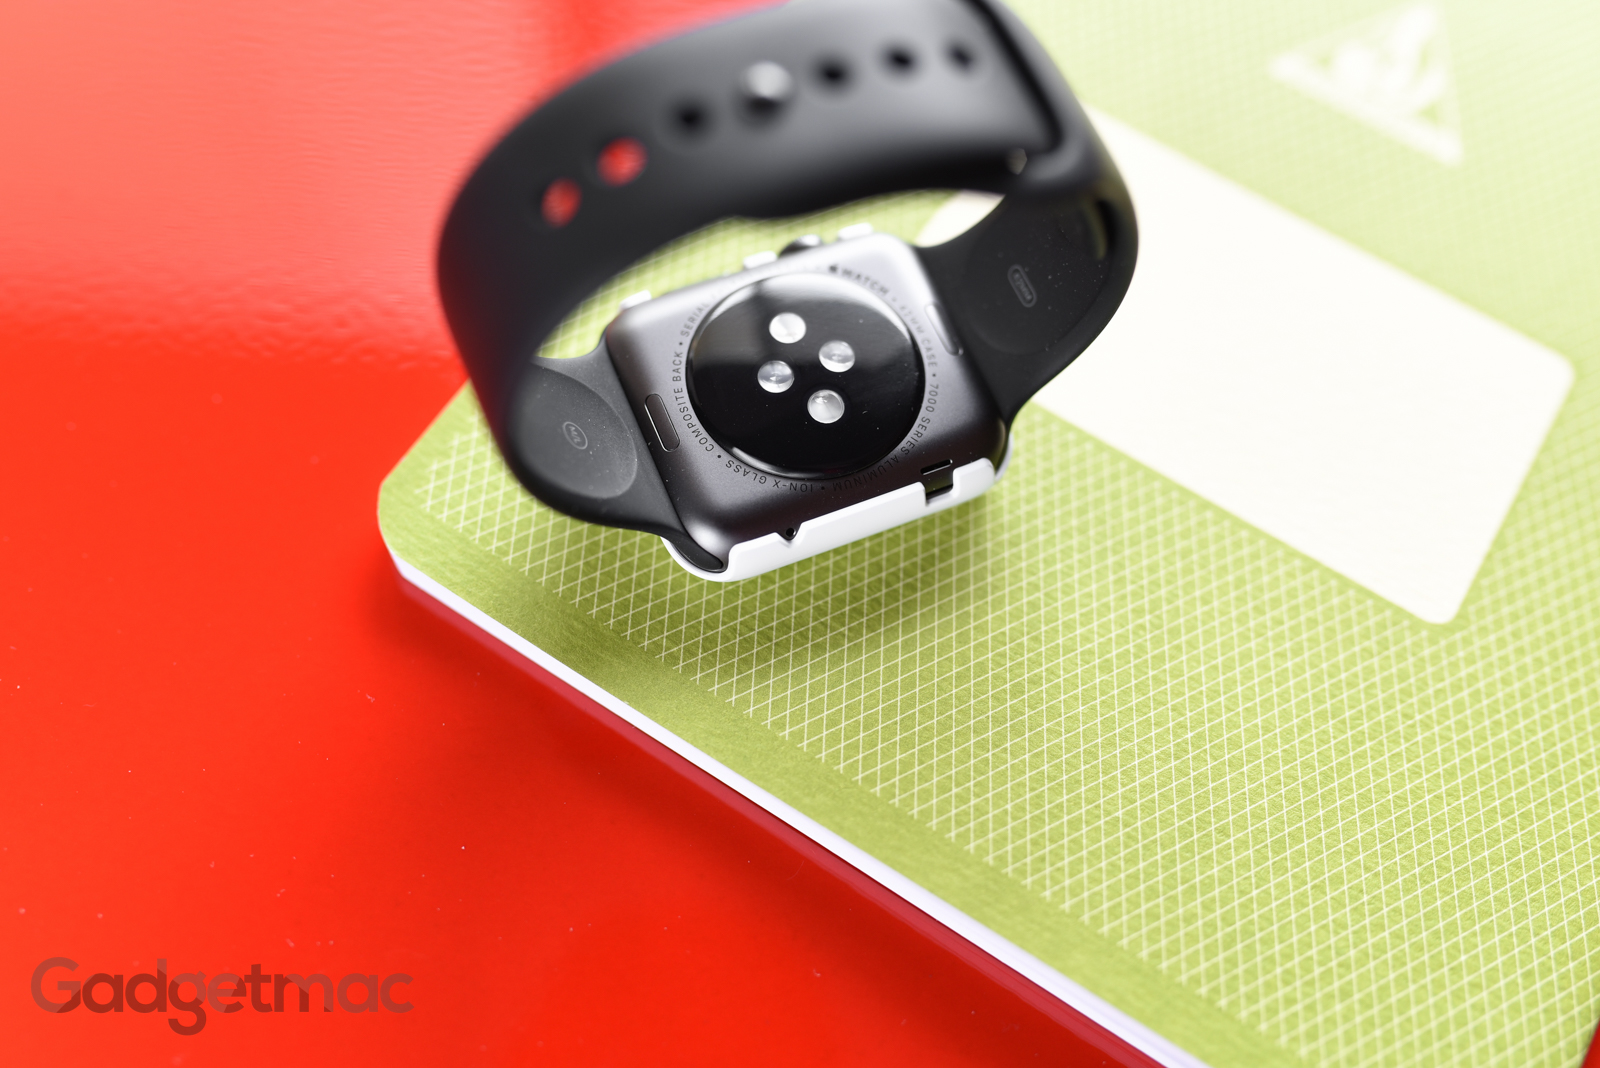 spigen-thin-fit-snap-on-case-for-apple-watch.jpg